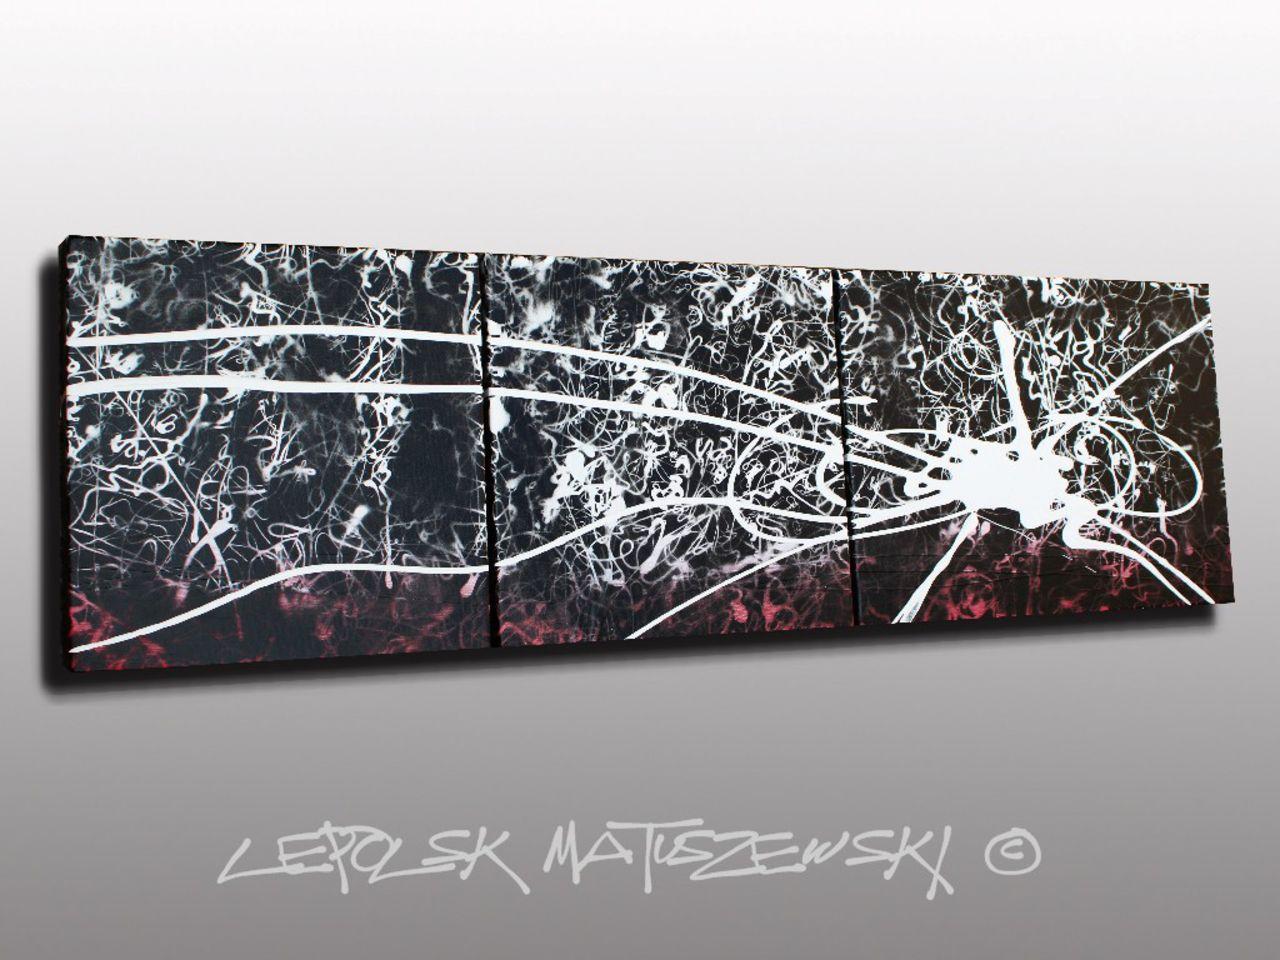 LEPOLSK MATUSZEWSKI INCANDESCENCE  Expressionnisme abstrait contemporain